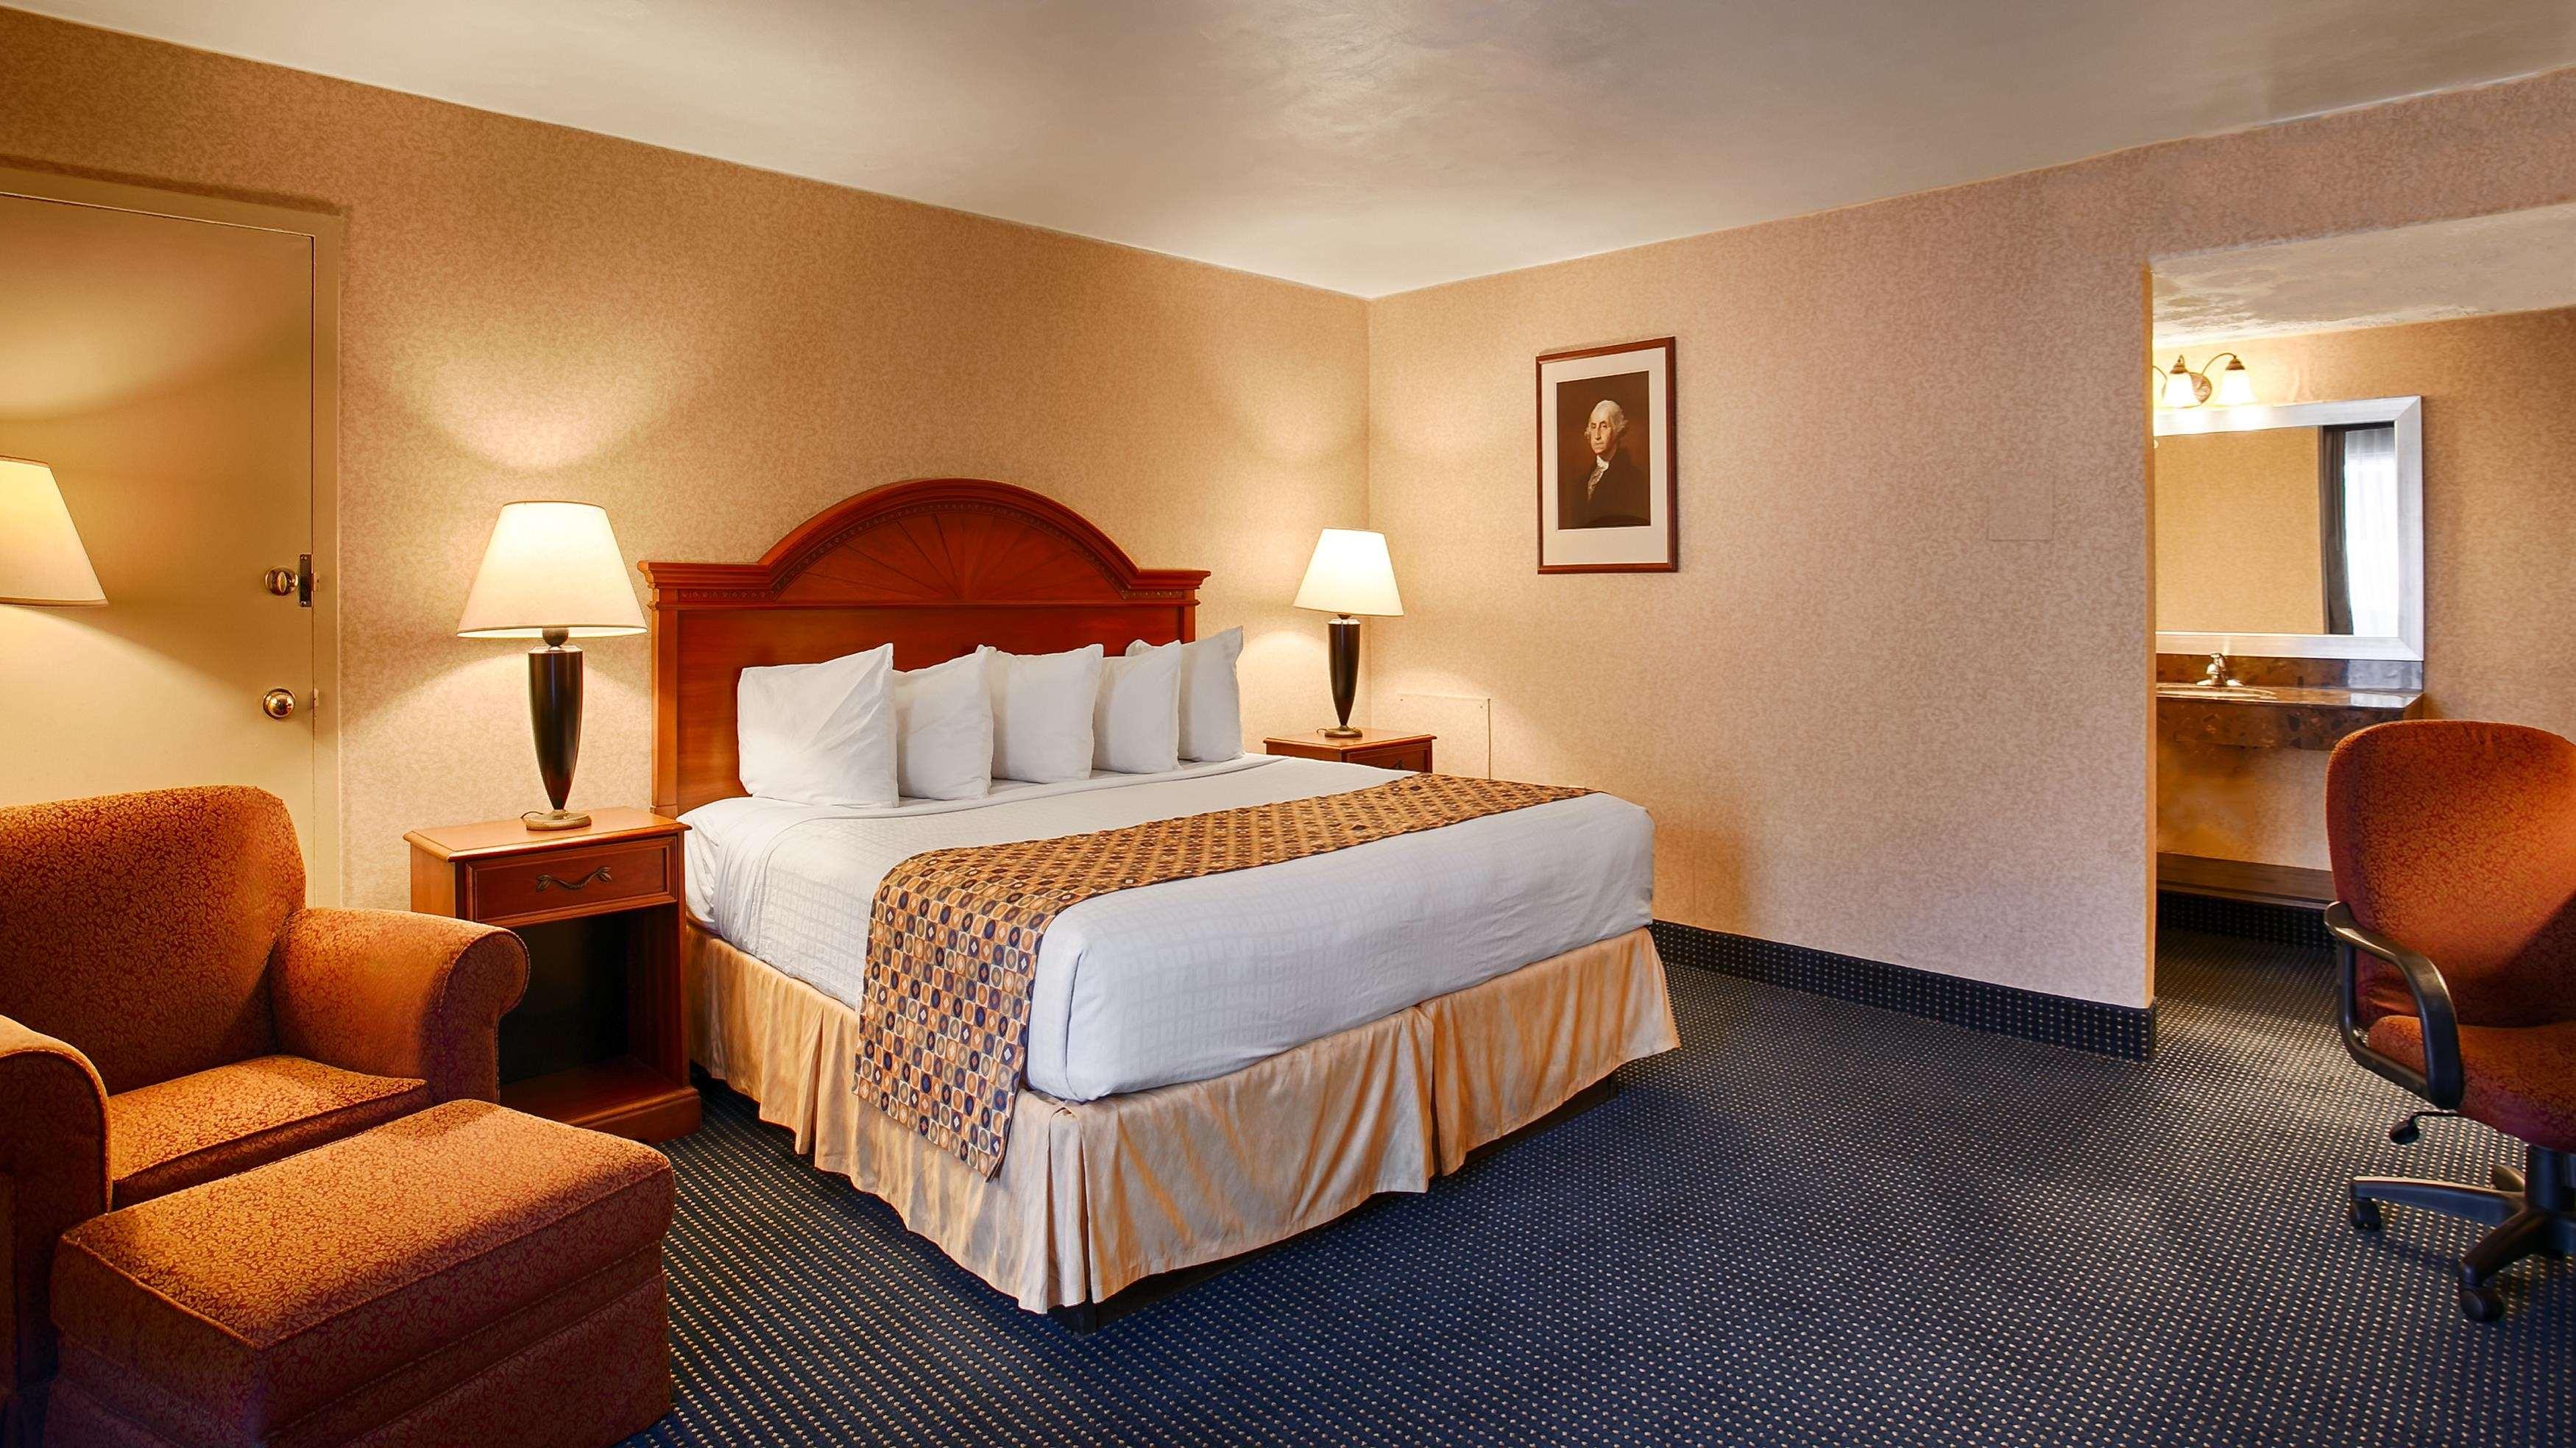 Best Western Pentagon Hotel - Reagan Airport image 10